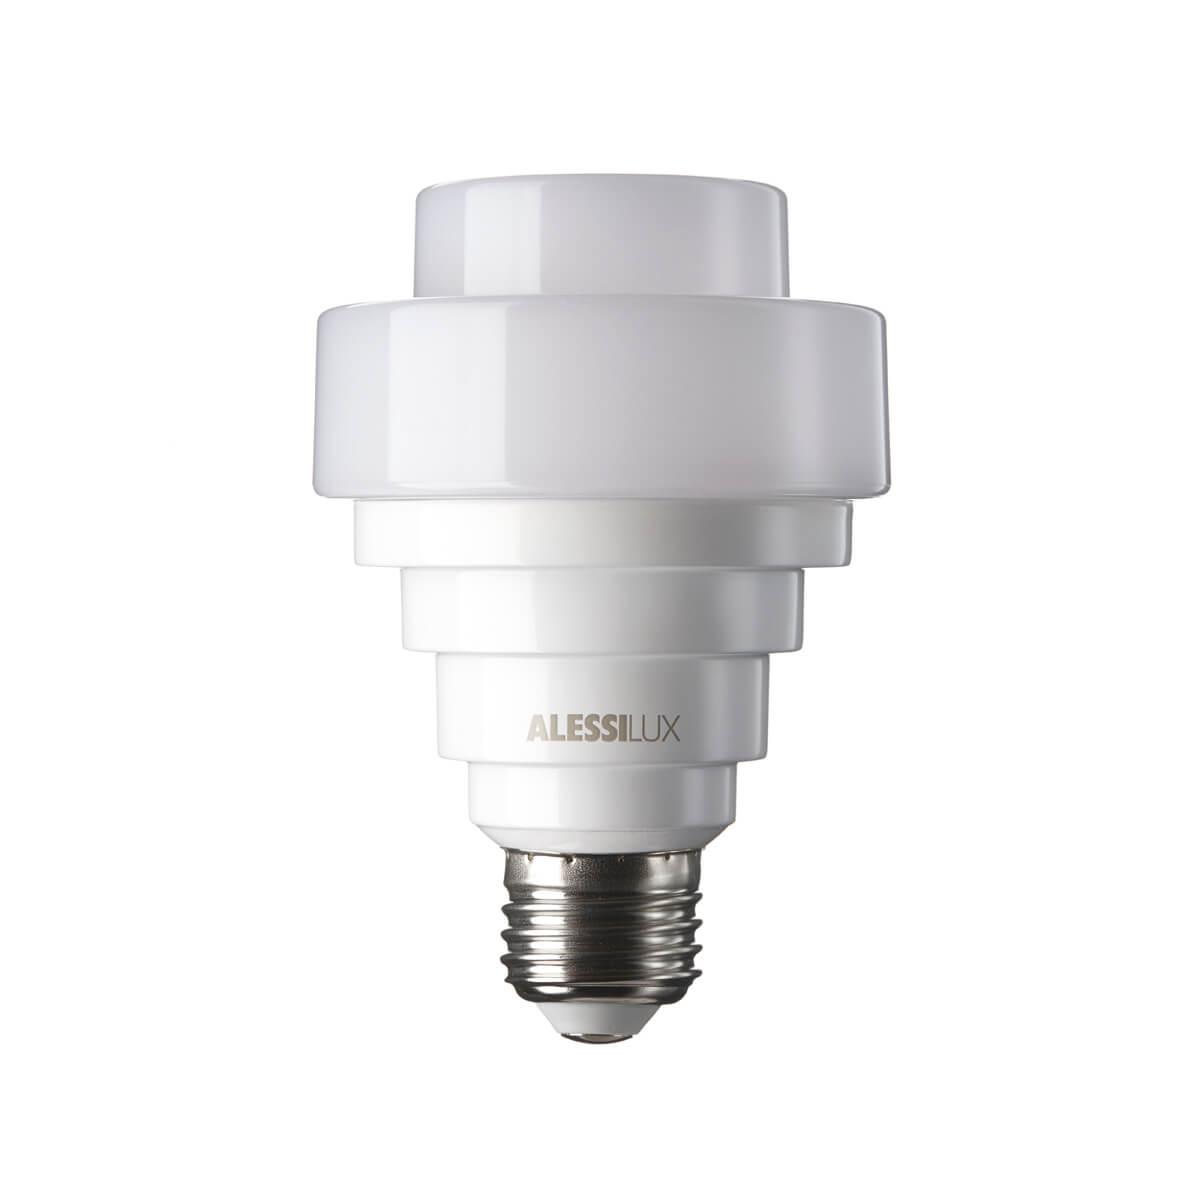 Polaris, LED light bulb for Alessilux